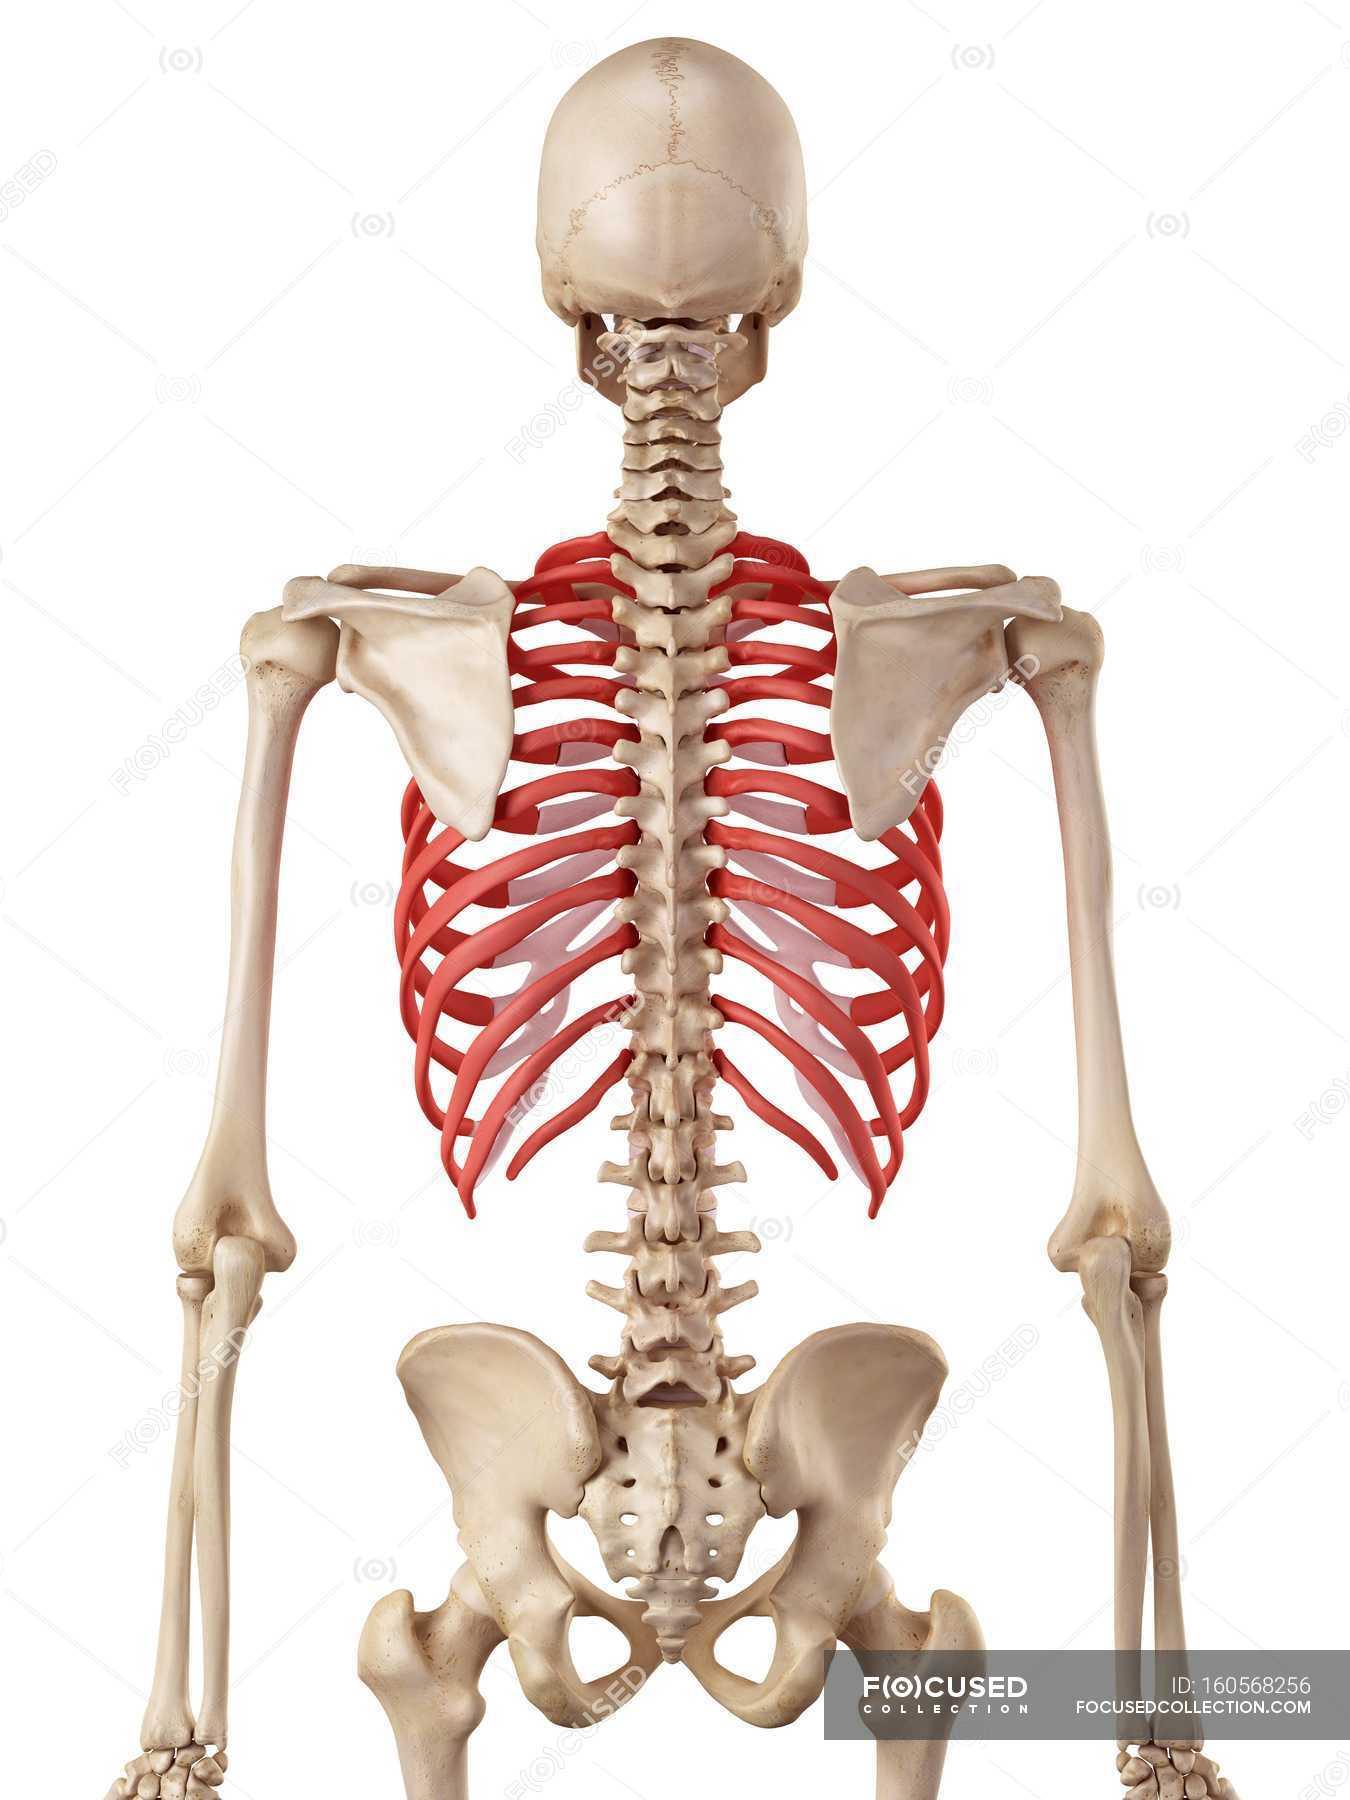 Human rib cage anatomy — Stock Photo | #160568256